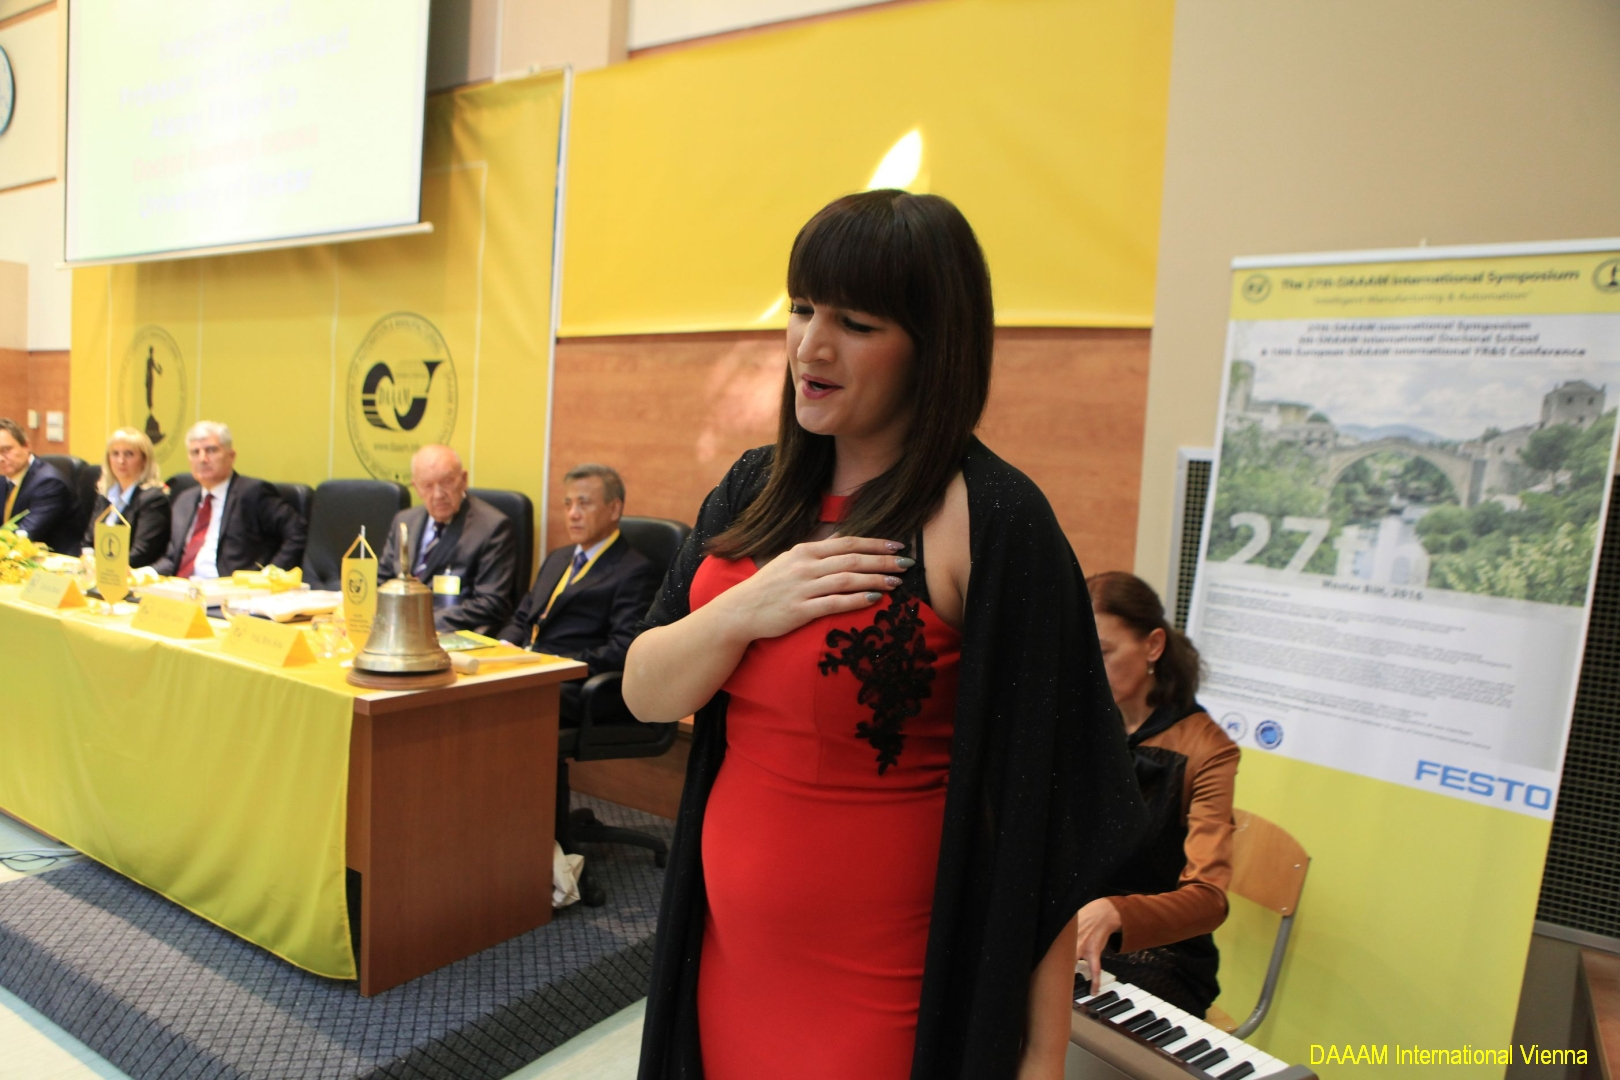 DAAAM_2016_Mostar_06_Professor_and_Cosmonaut_Alexey_Eliseev_Doctor_honors_causa_041